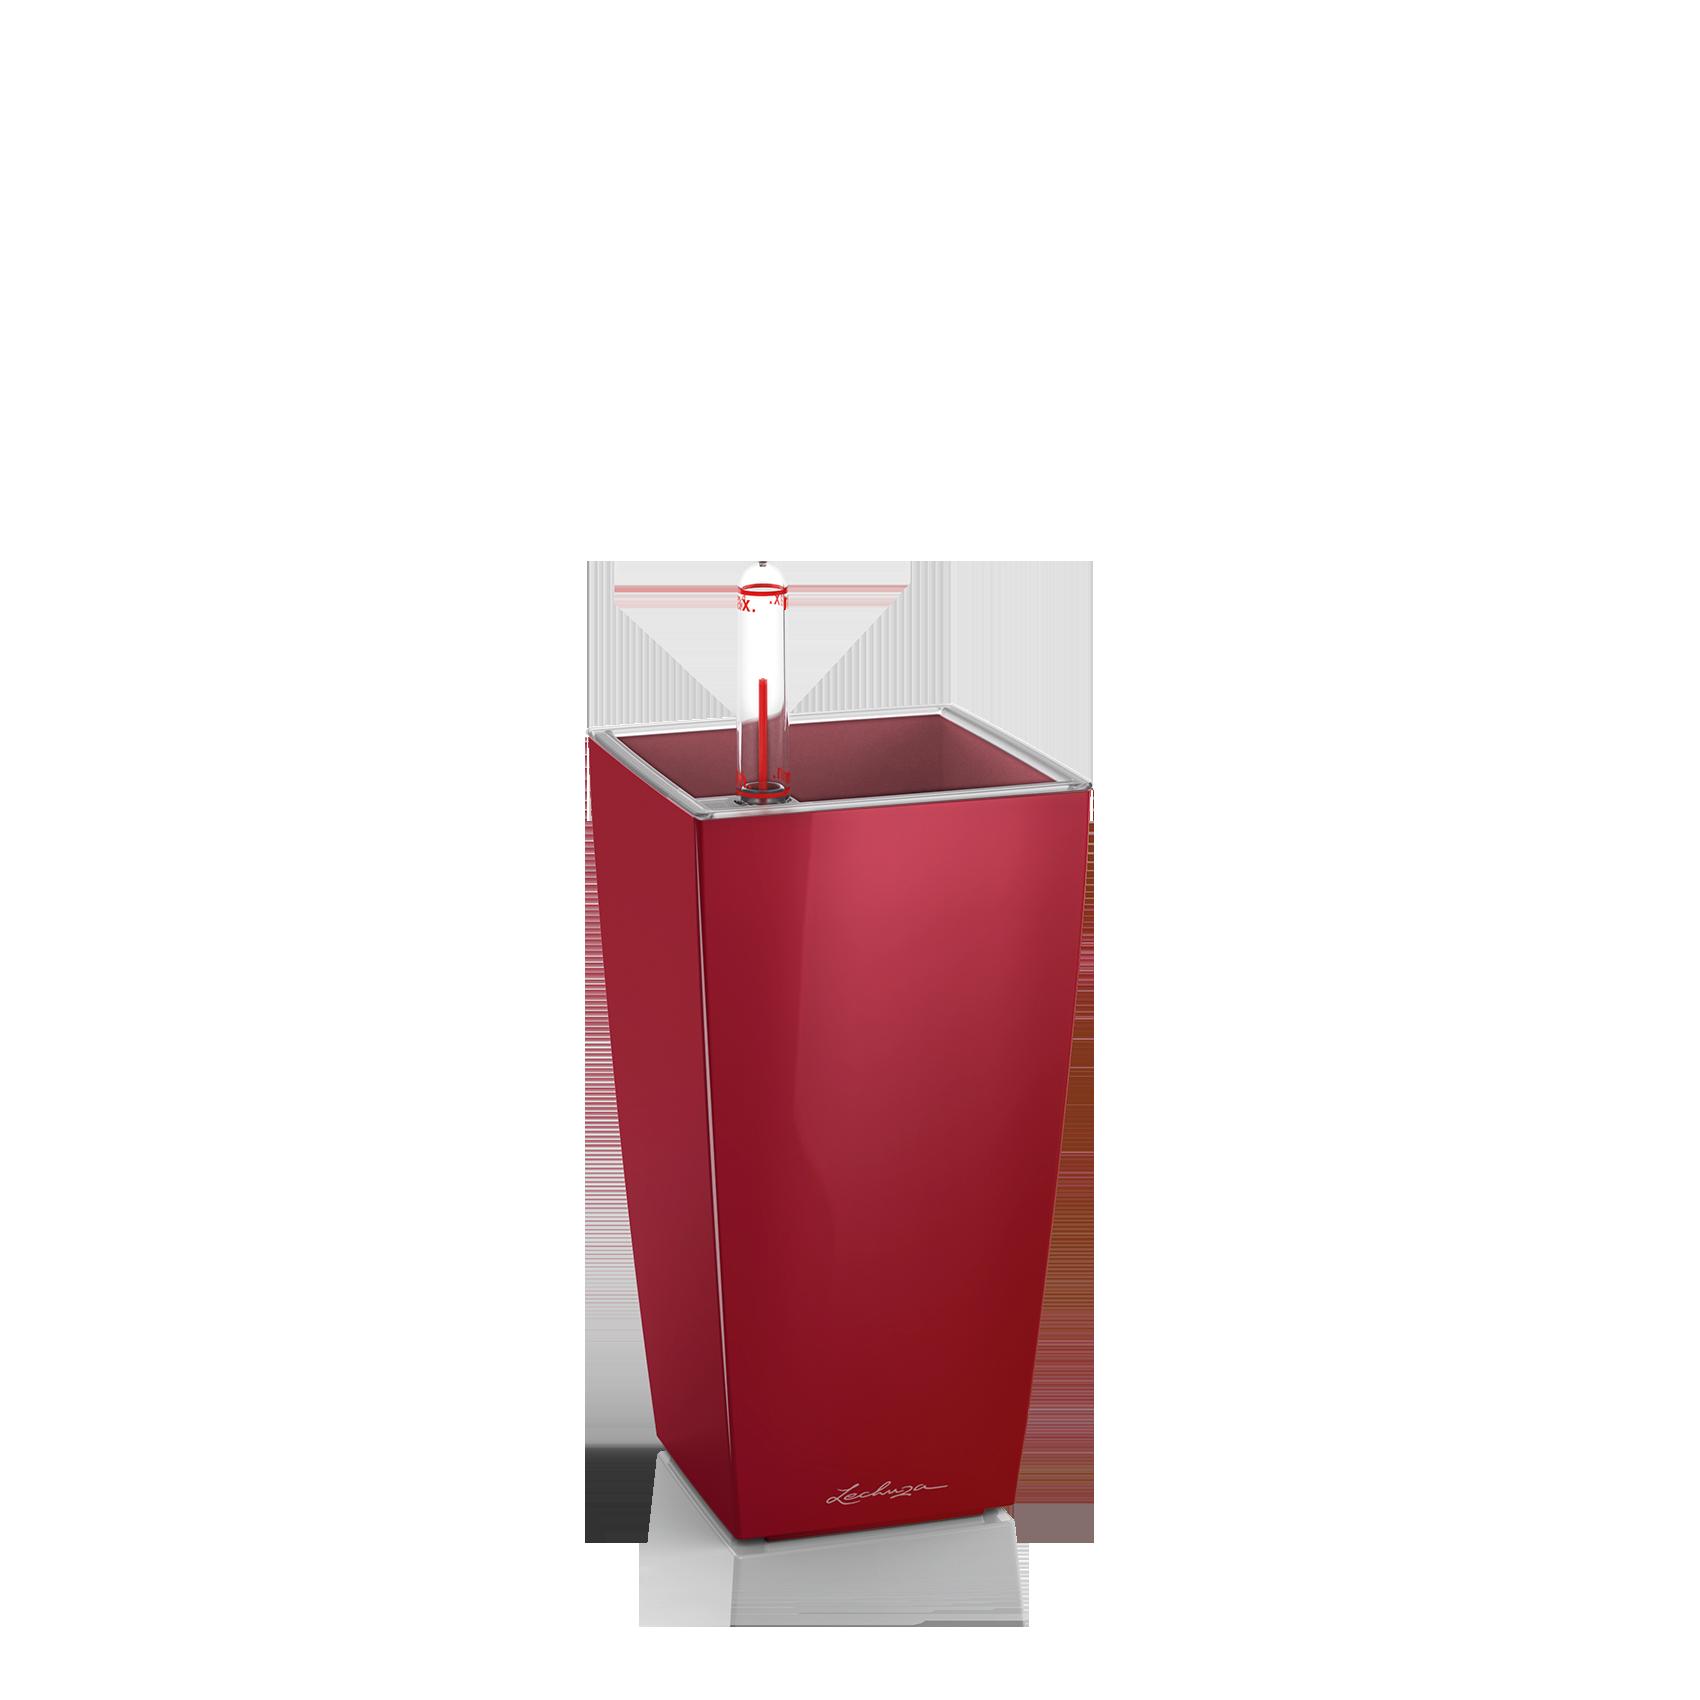 MINI-CUBI scarlet red high-gloss